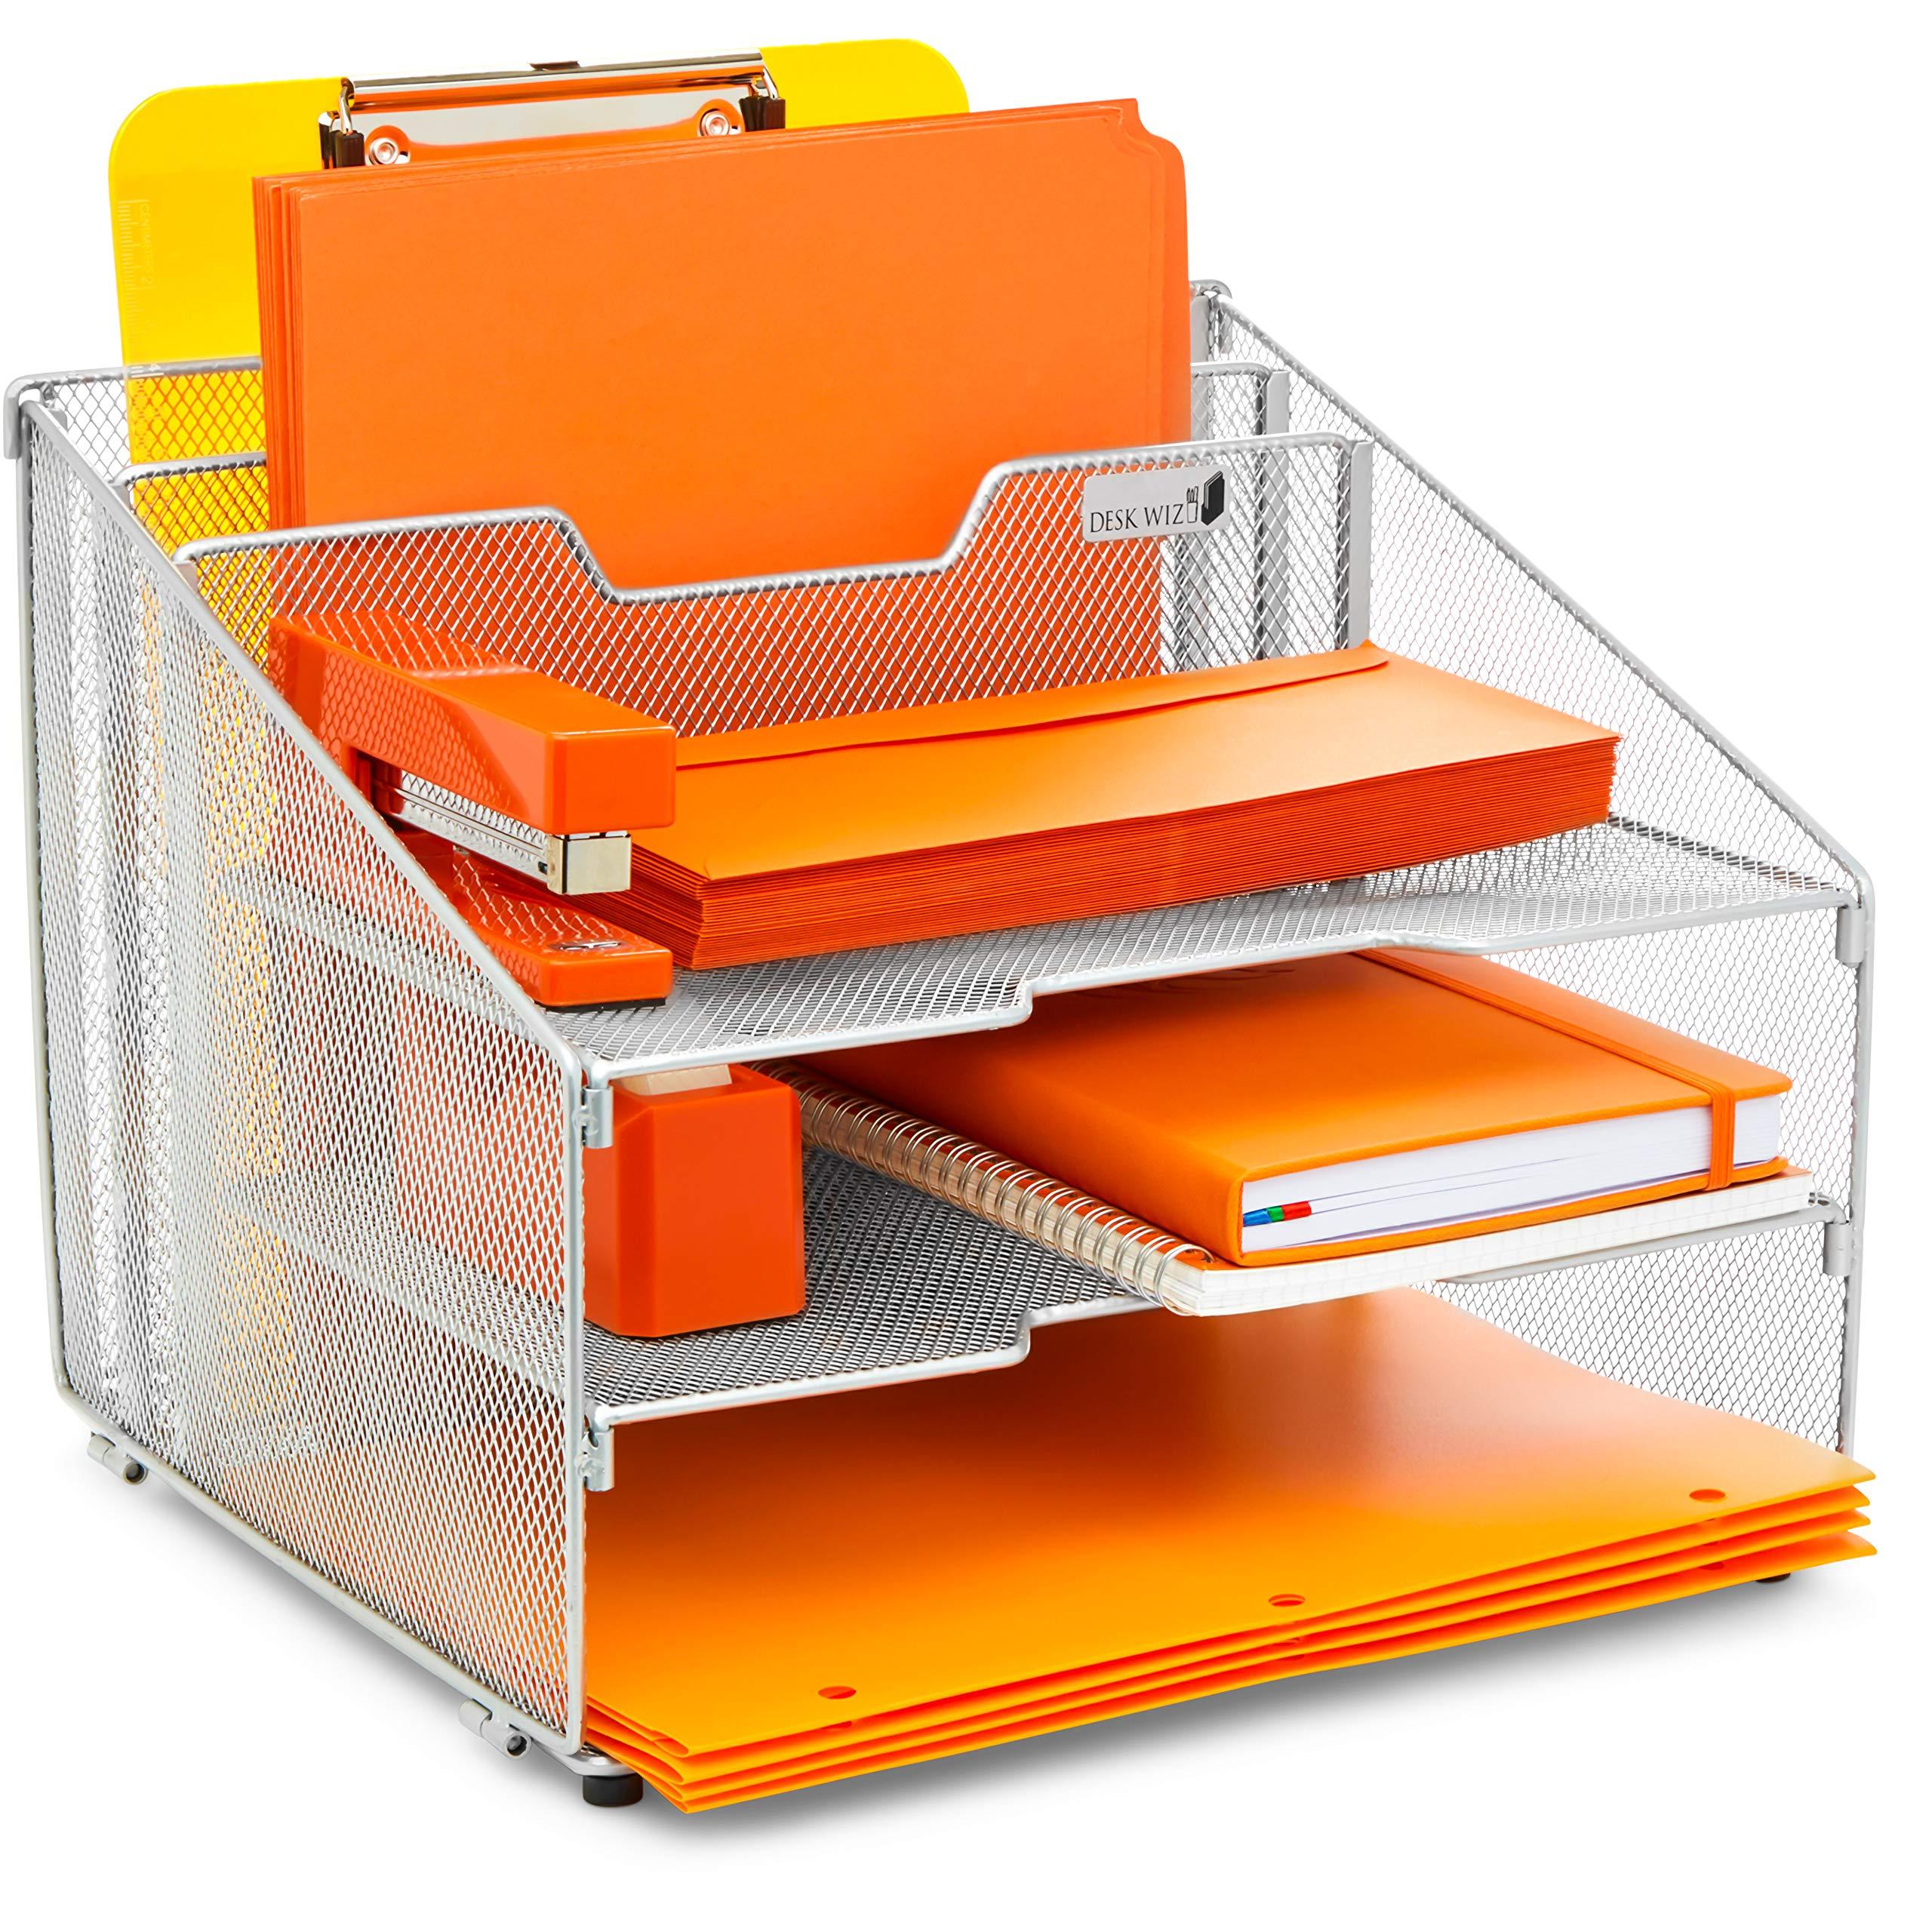 Outstanding Desk Wiz Desk Organizer File Folder Holder All In One With Home Remodeling Inspirations Cosmcuboardxyz